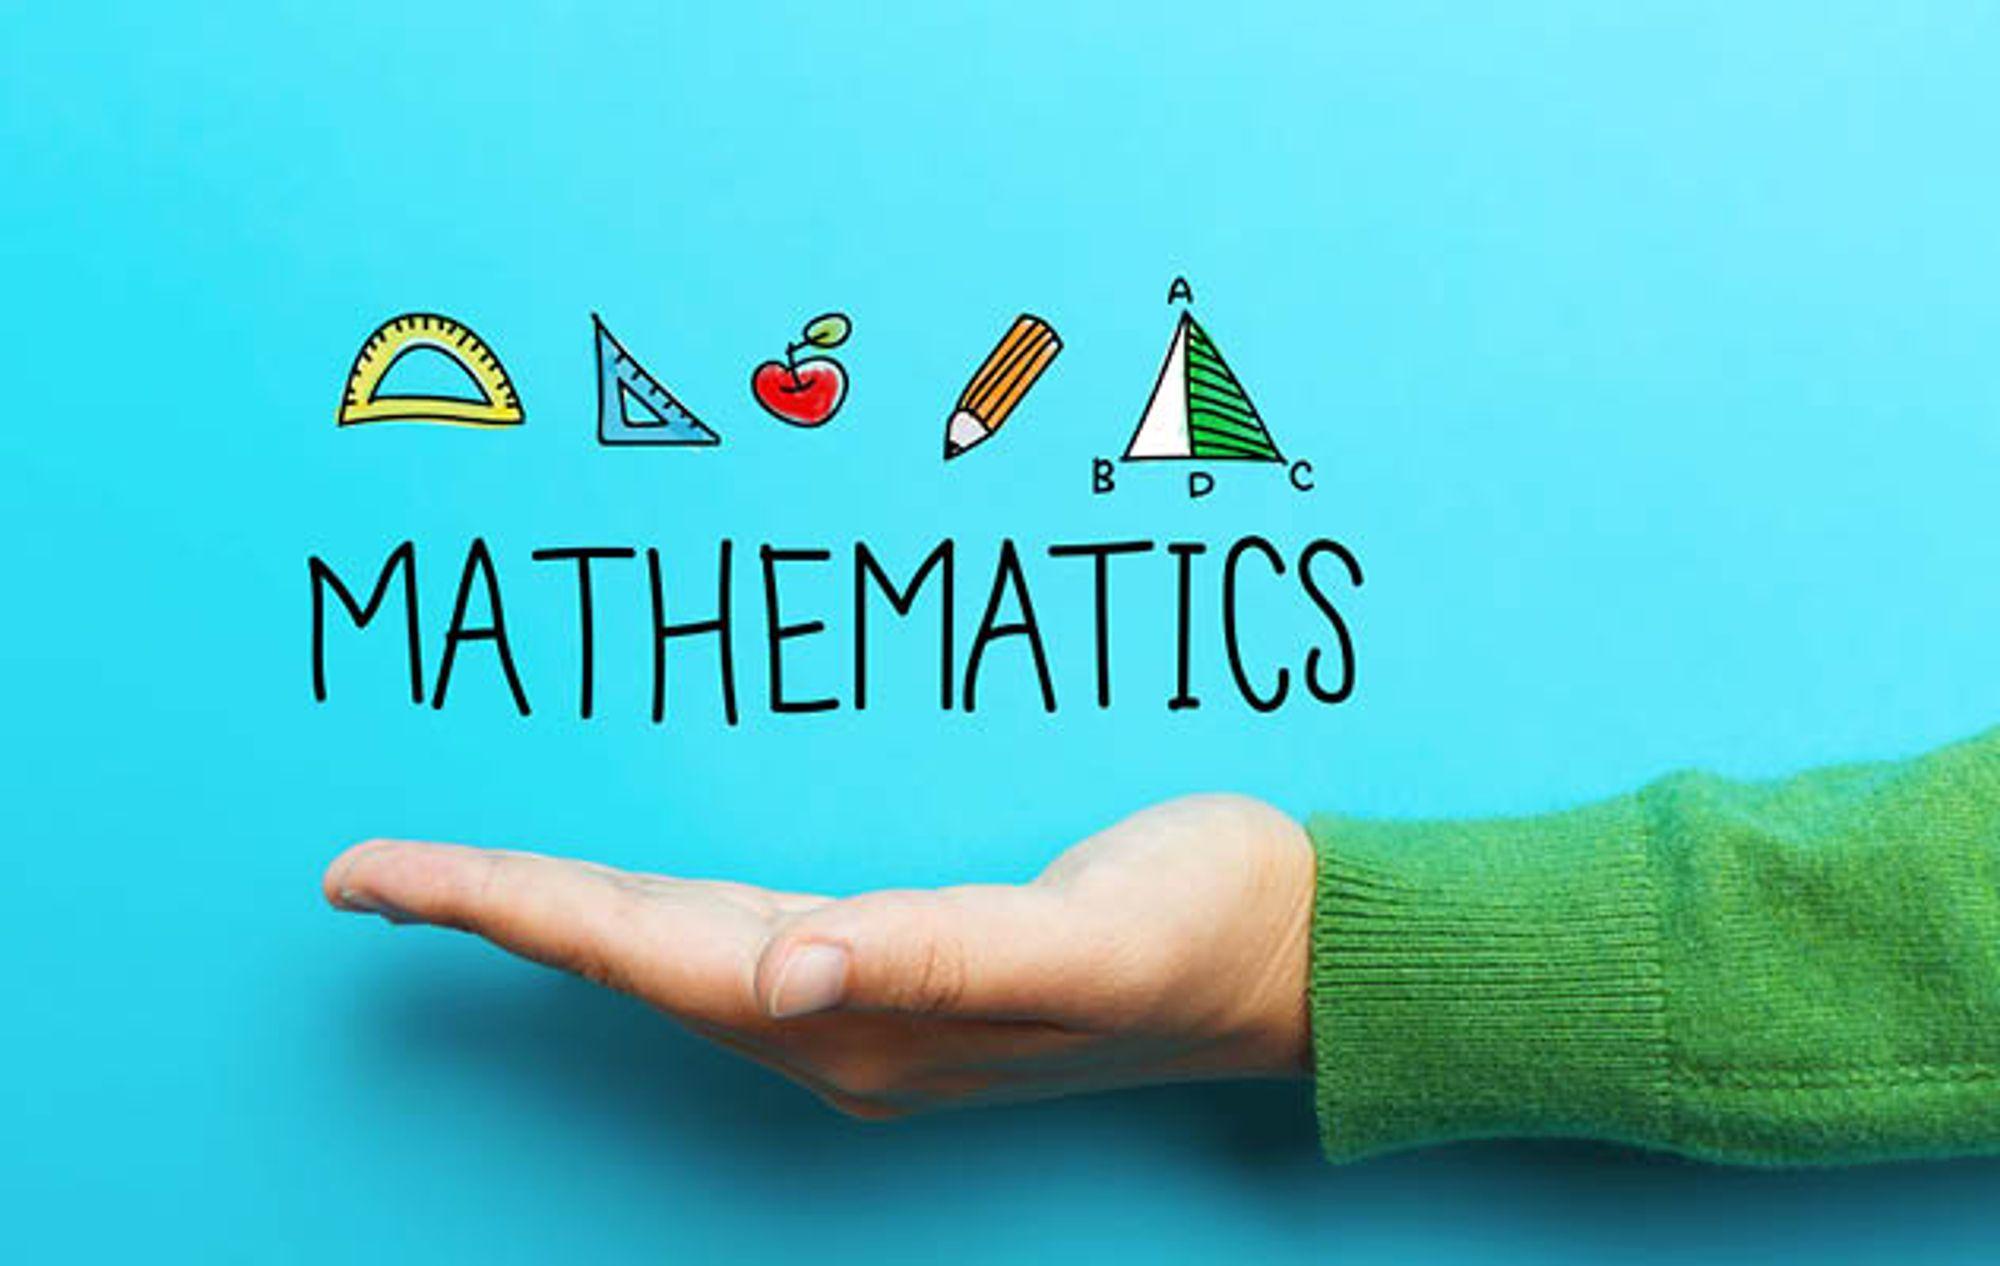 Mathematics_at_your_hand.jpg